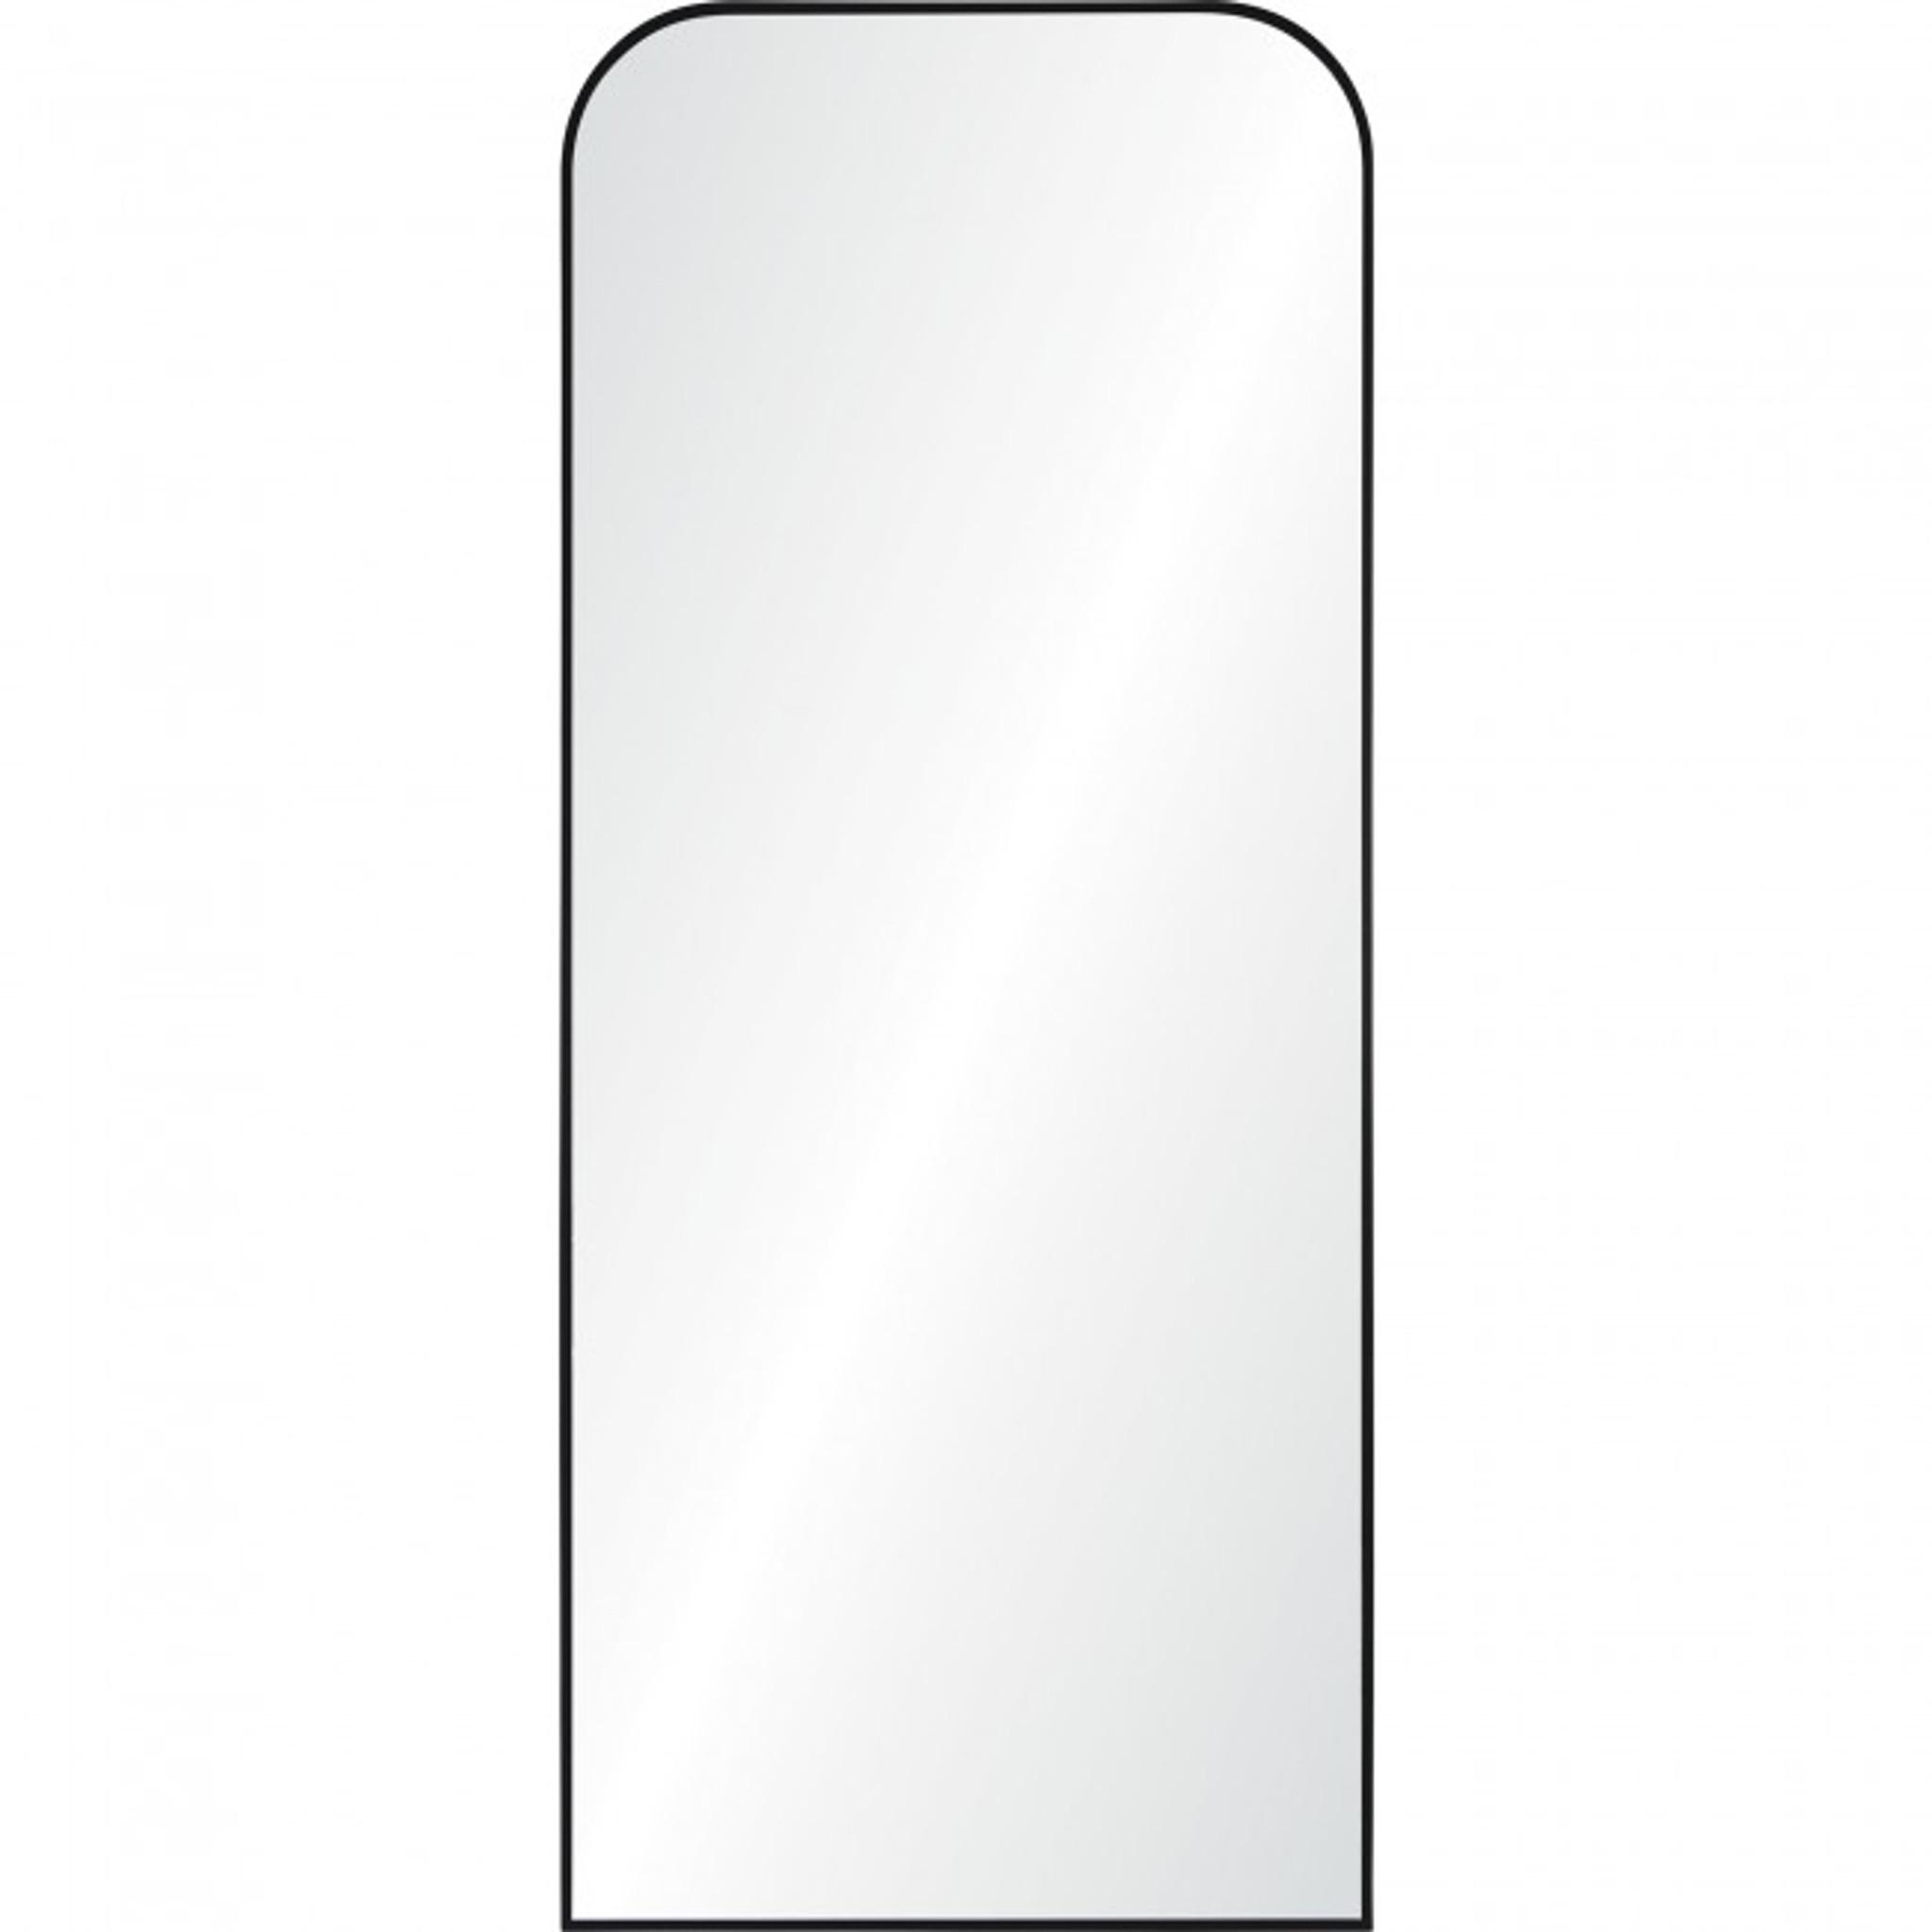 renwil mandret arch top modern rounded black metal leaner wall floor mirror